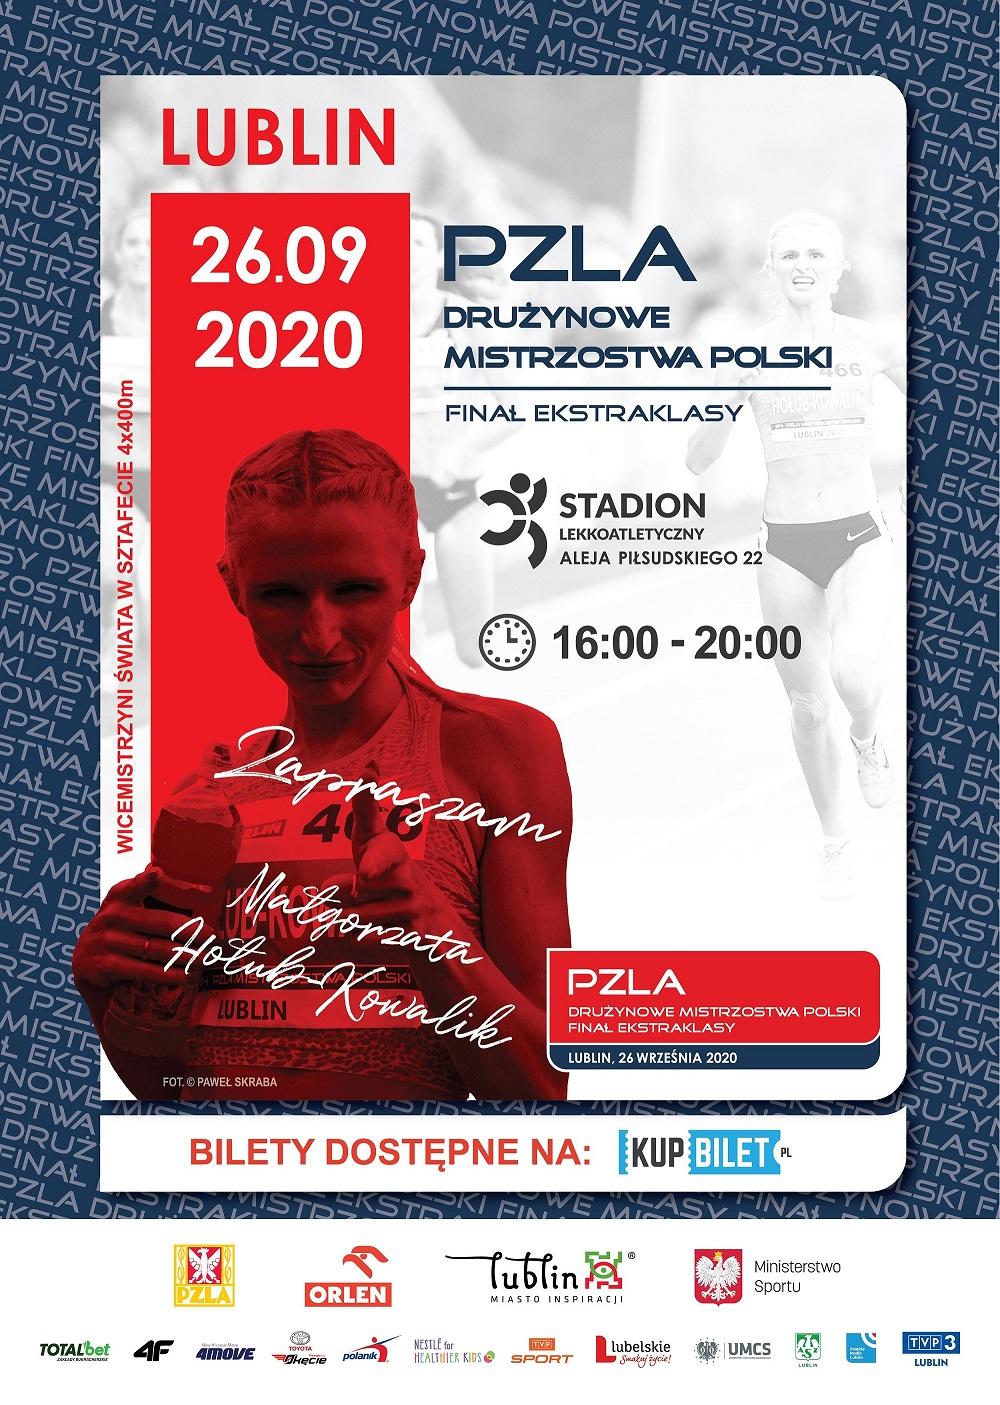 Lublin2020